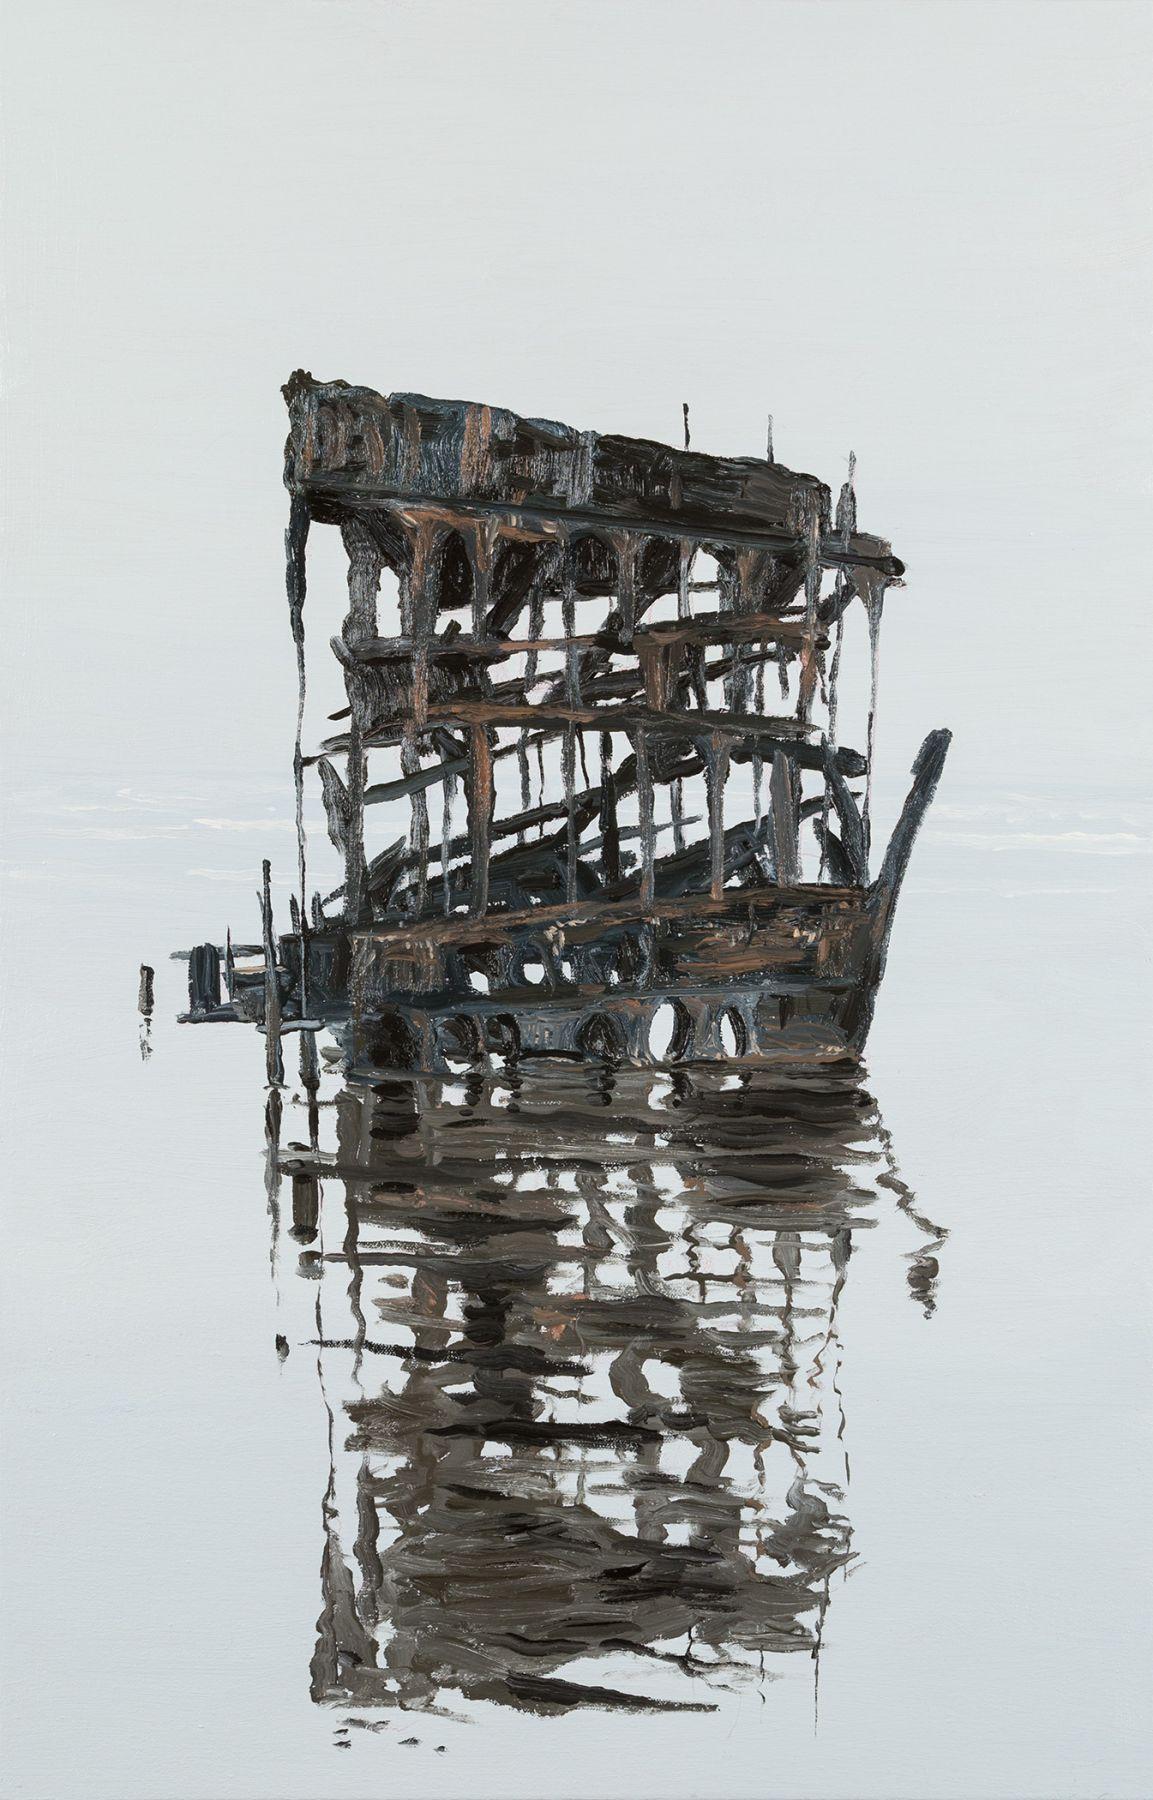 Brophy - Shipwreck